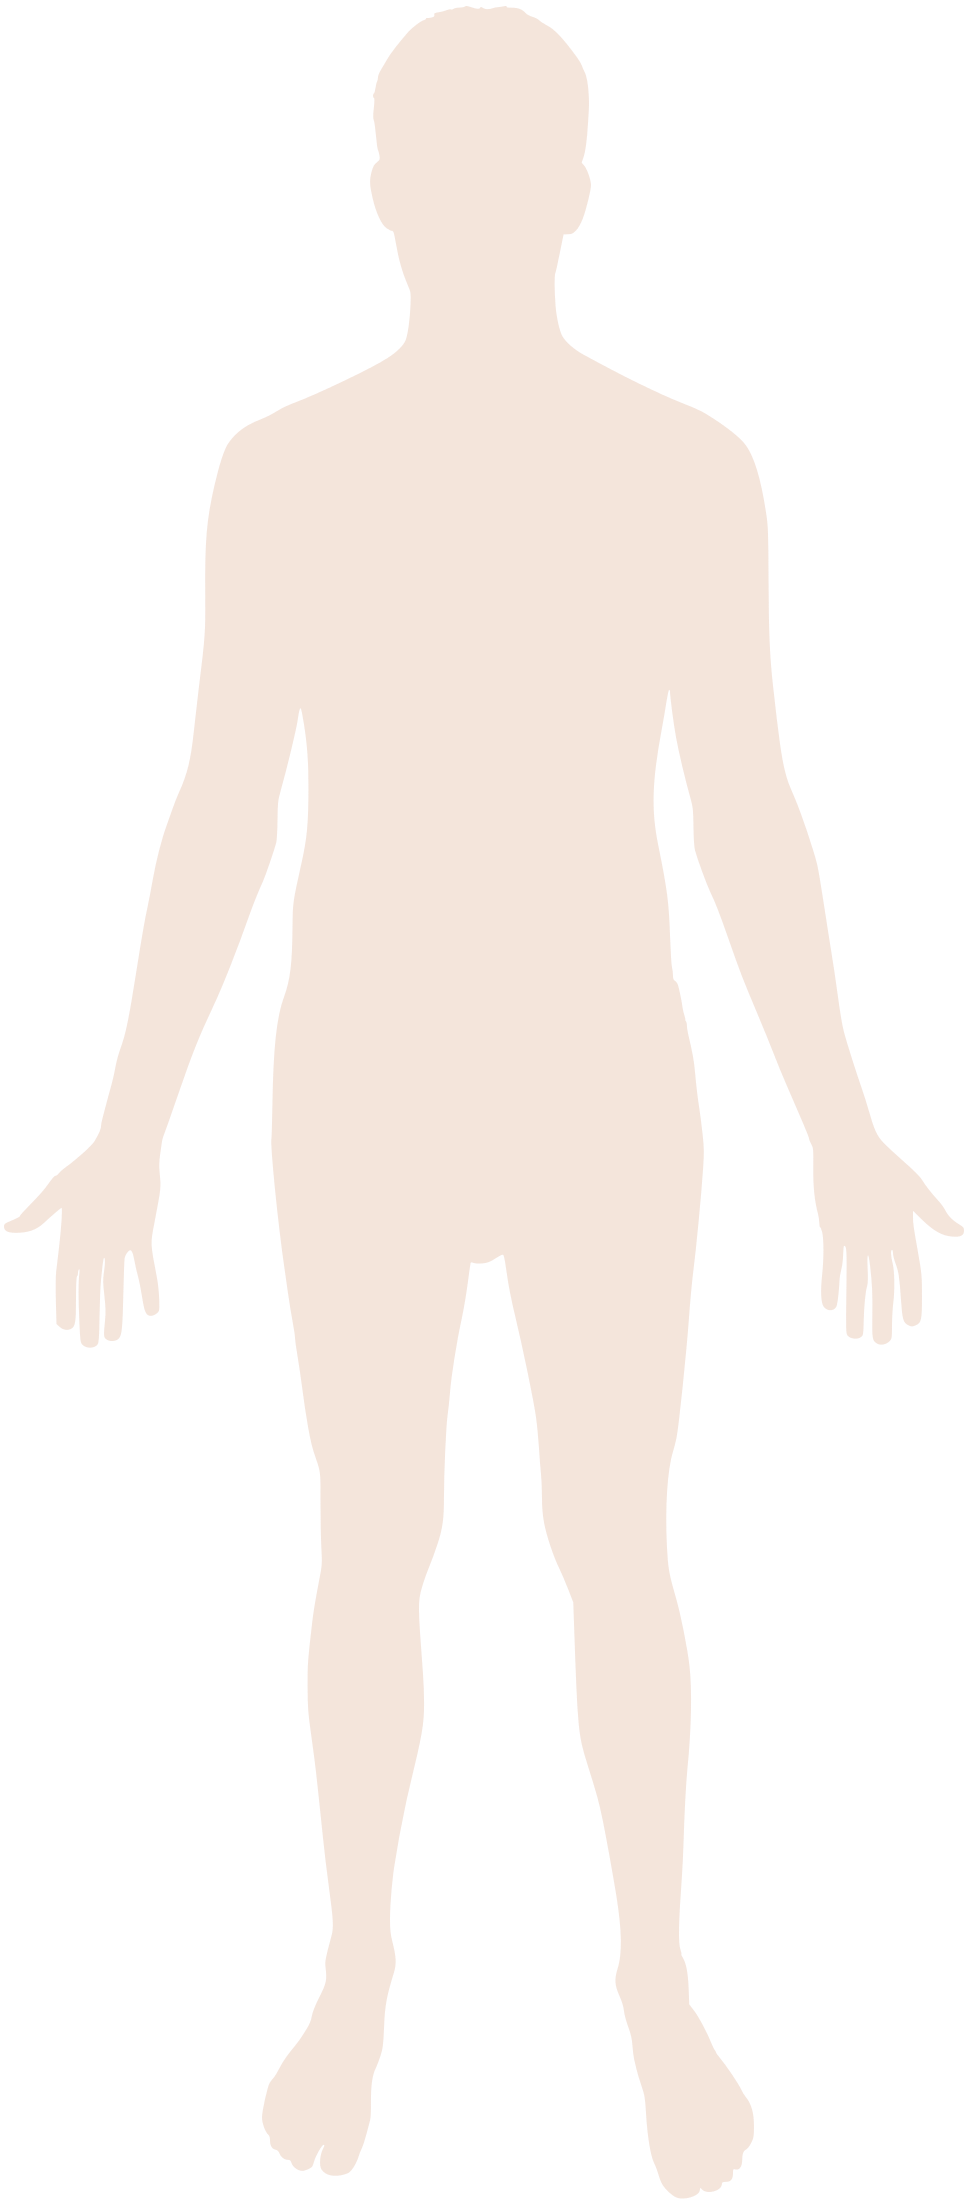 File:Human body silhouette.svg - Human Figure PNG HD